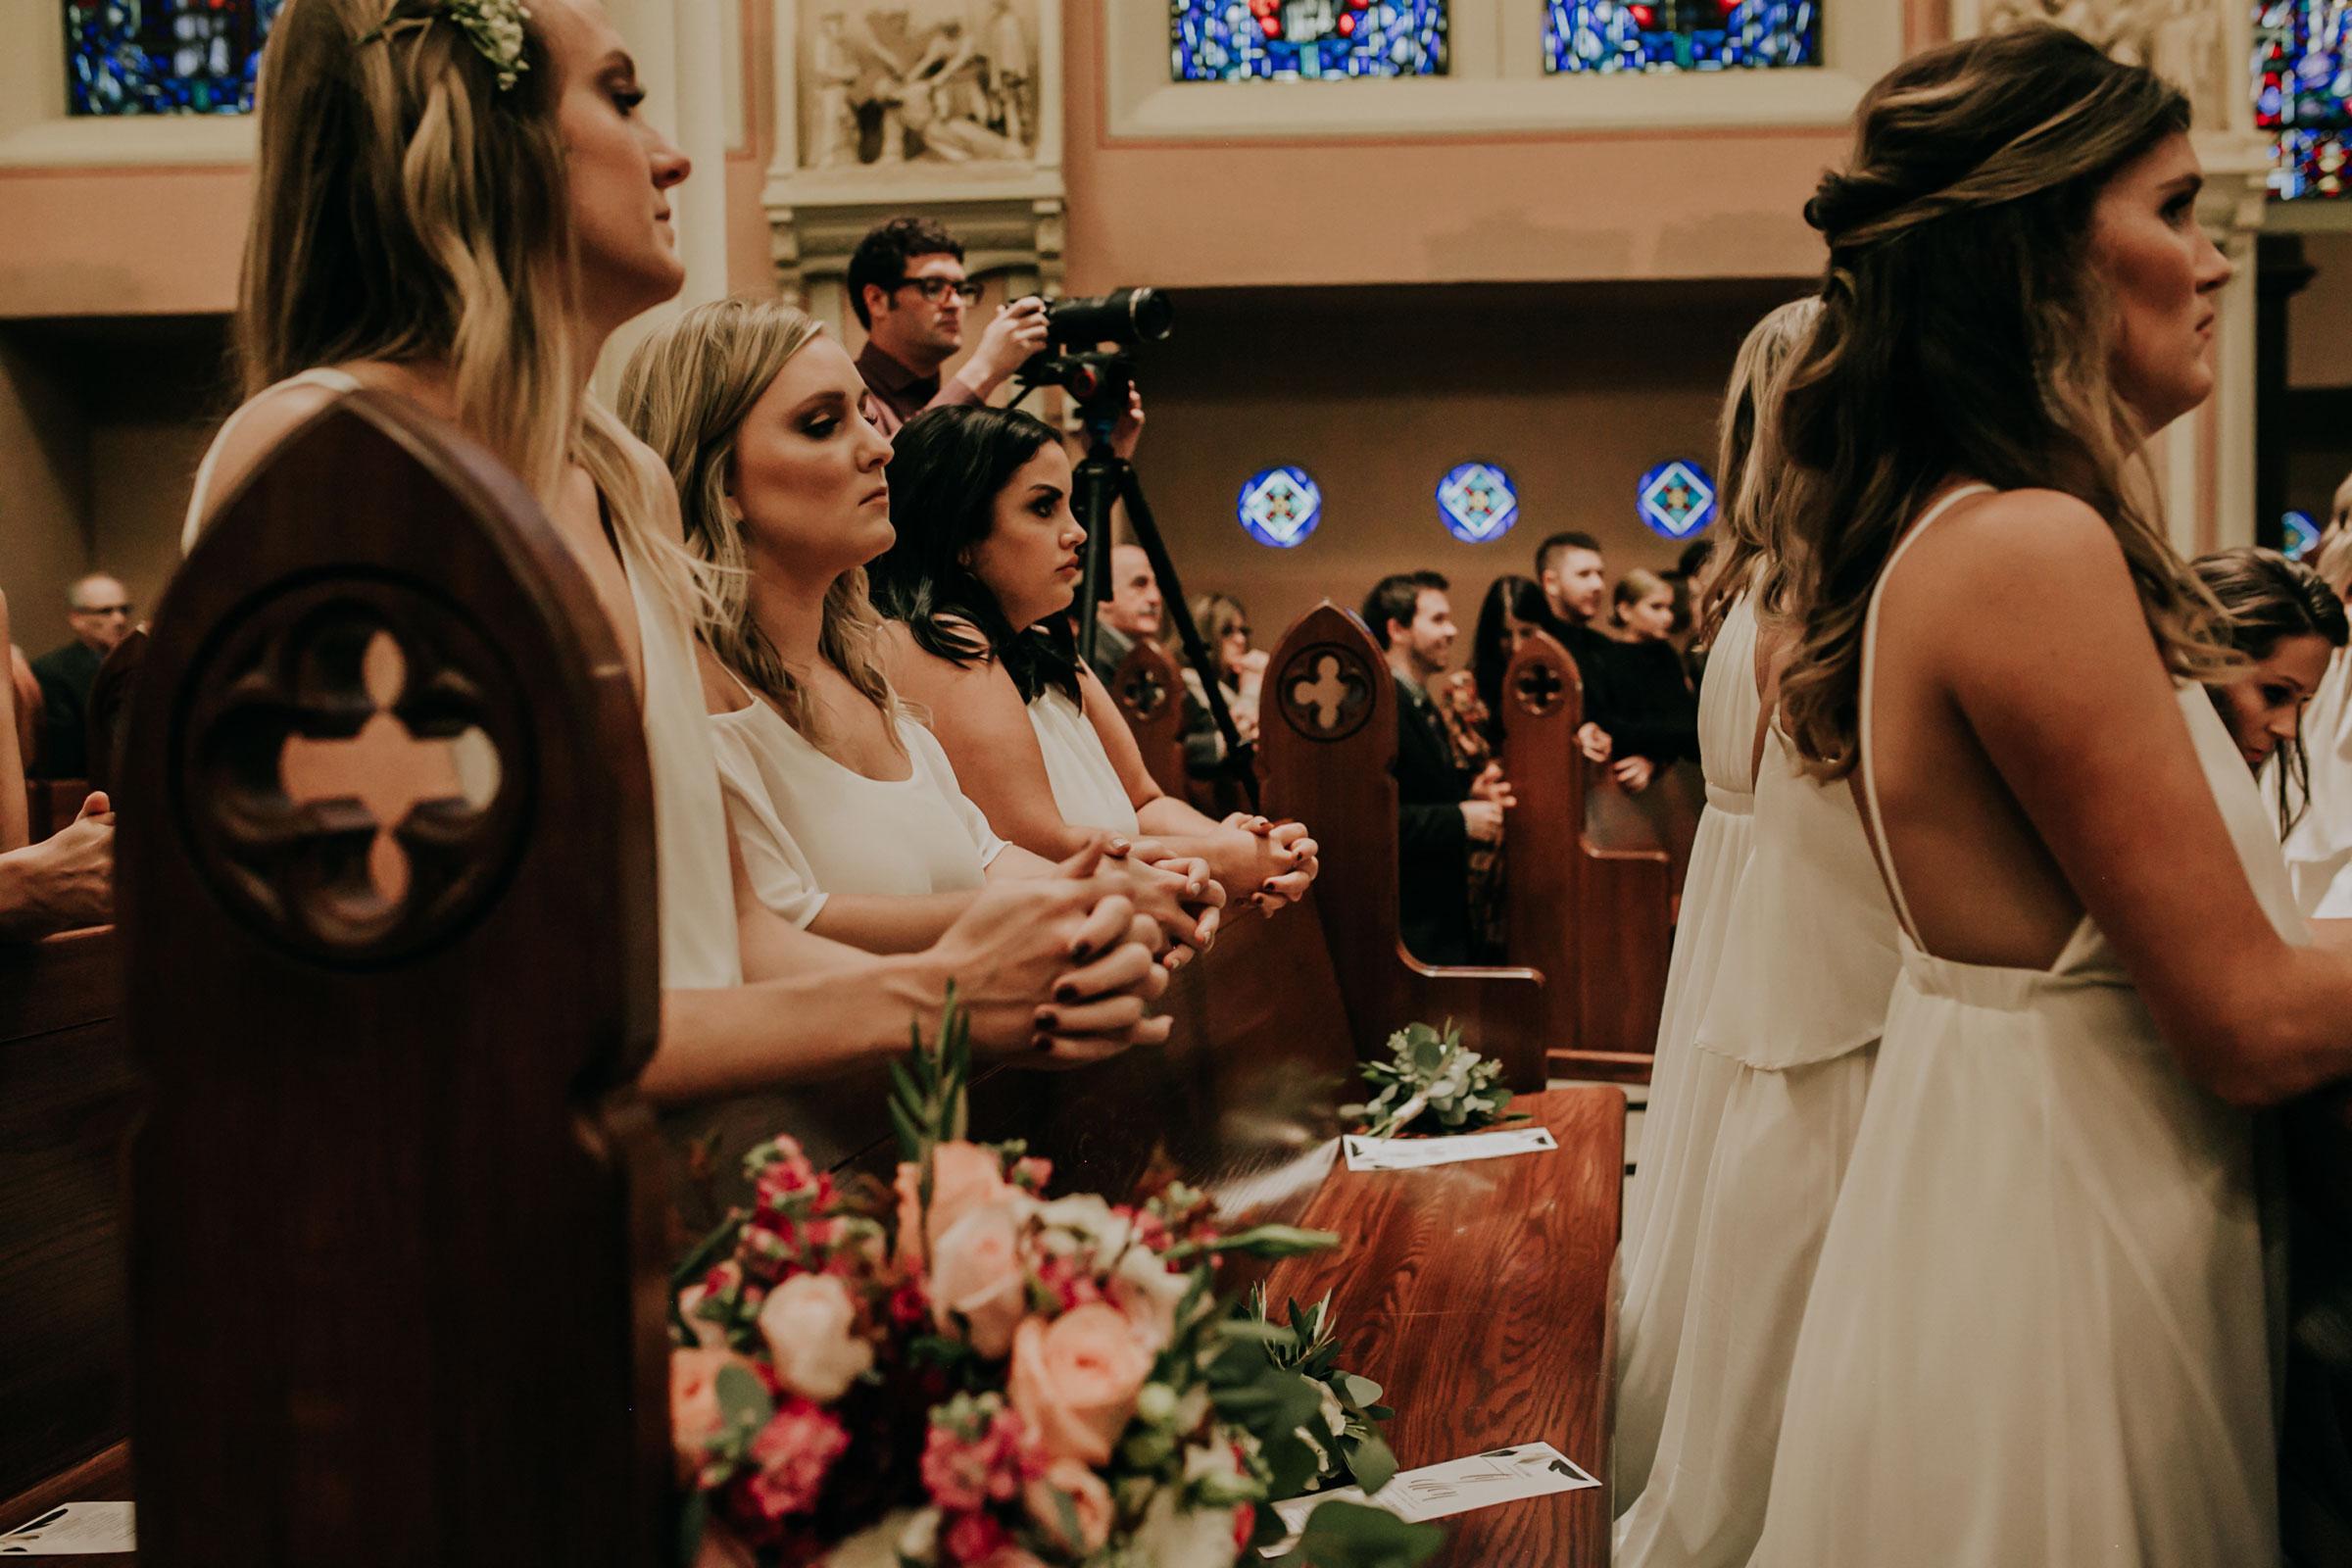 bridesmaids-praying-during-ceremony-st-johns-church-at-creighton-omaha-nebraska-raelyn-ramey-photography.jpg